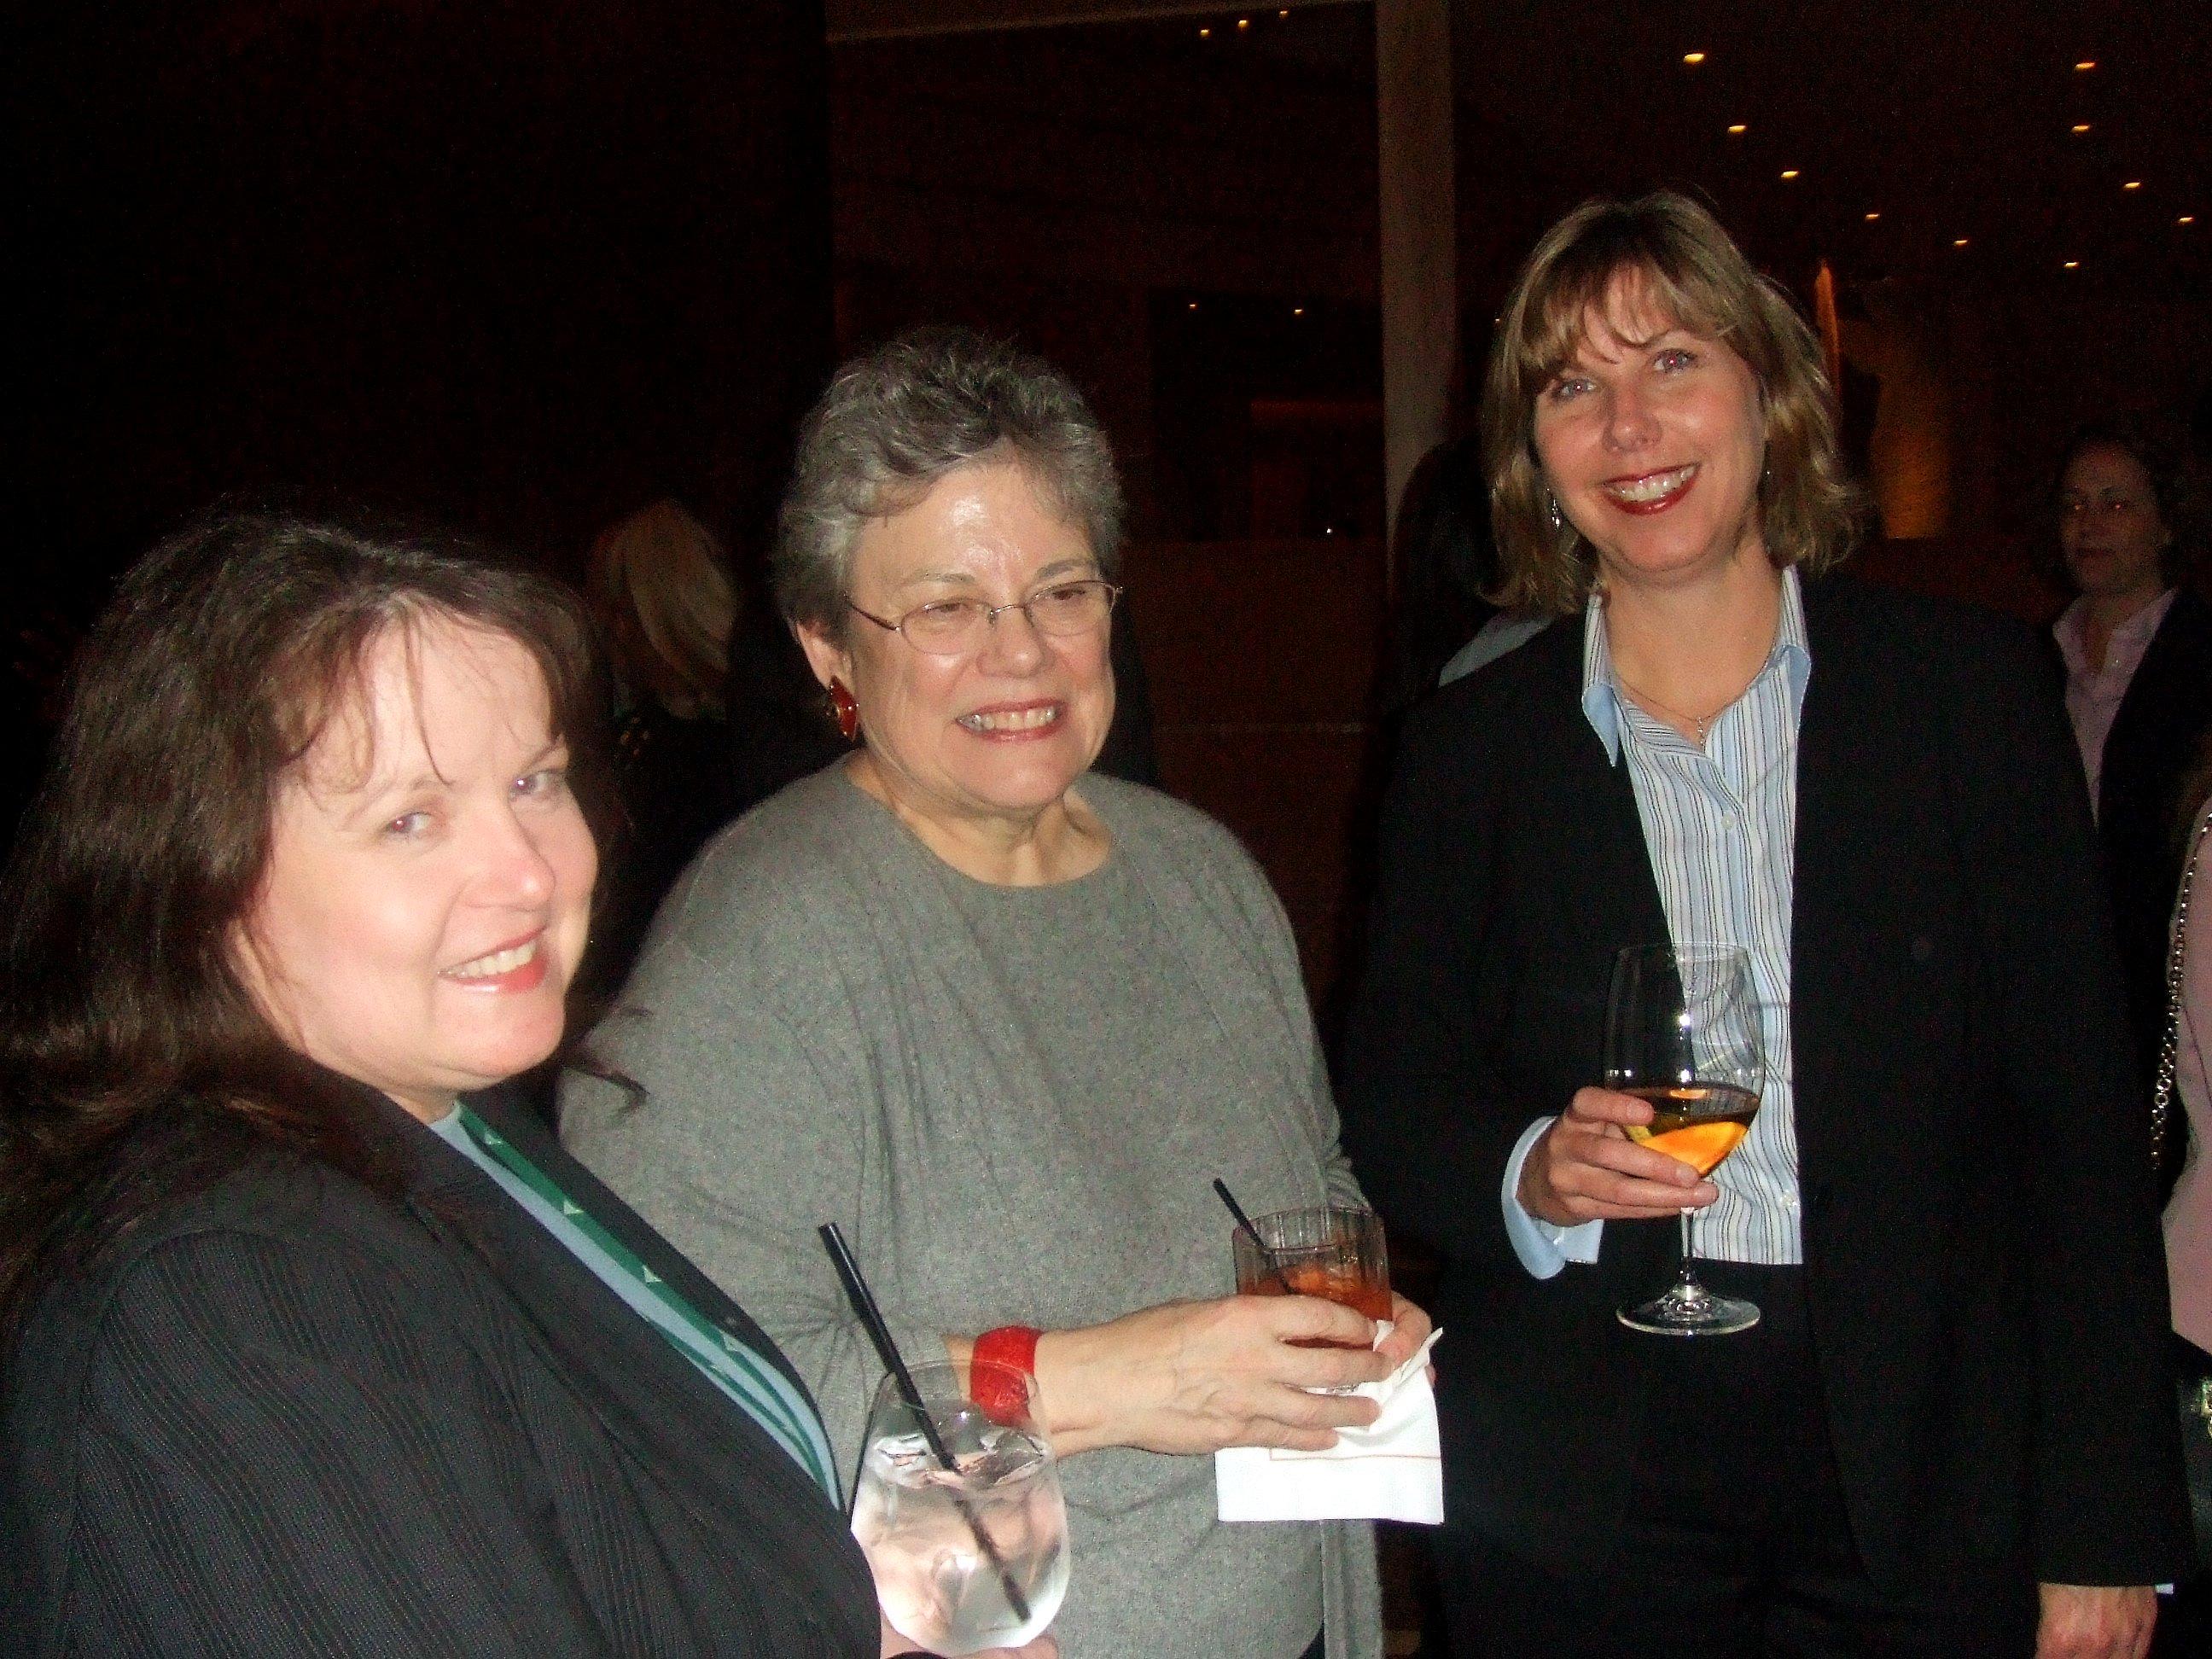 Gary Crum, Herman Kluge and Anne Warnock